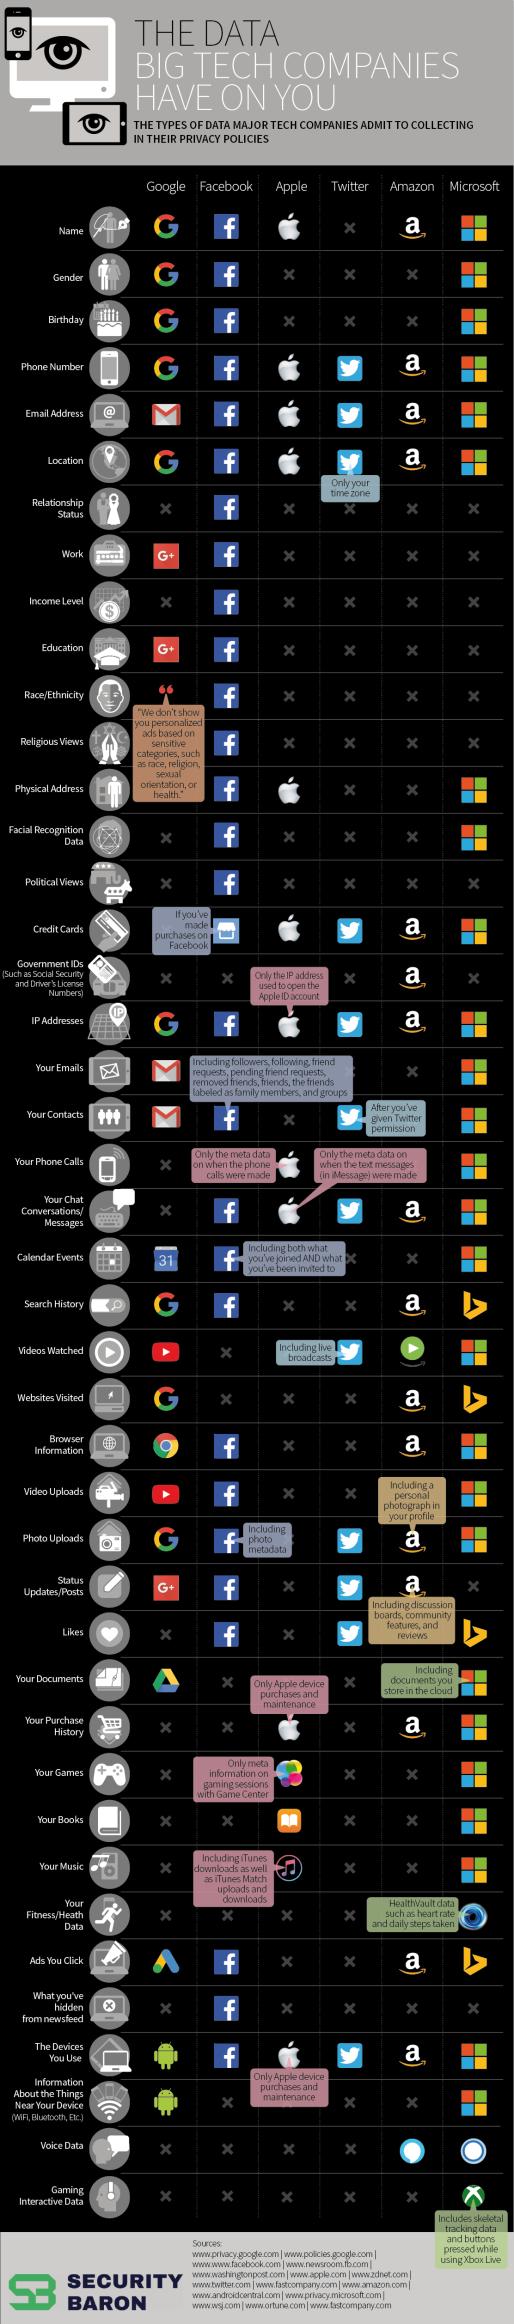 data-tech-companies